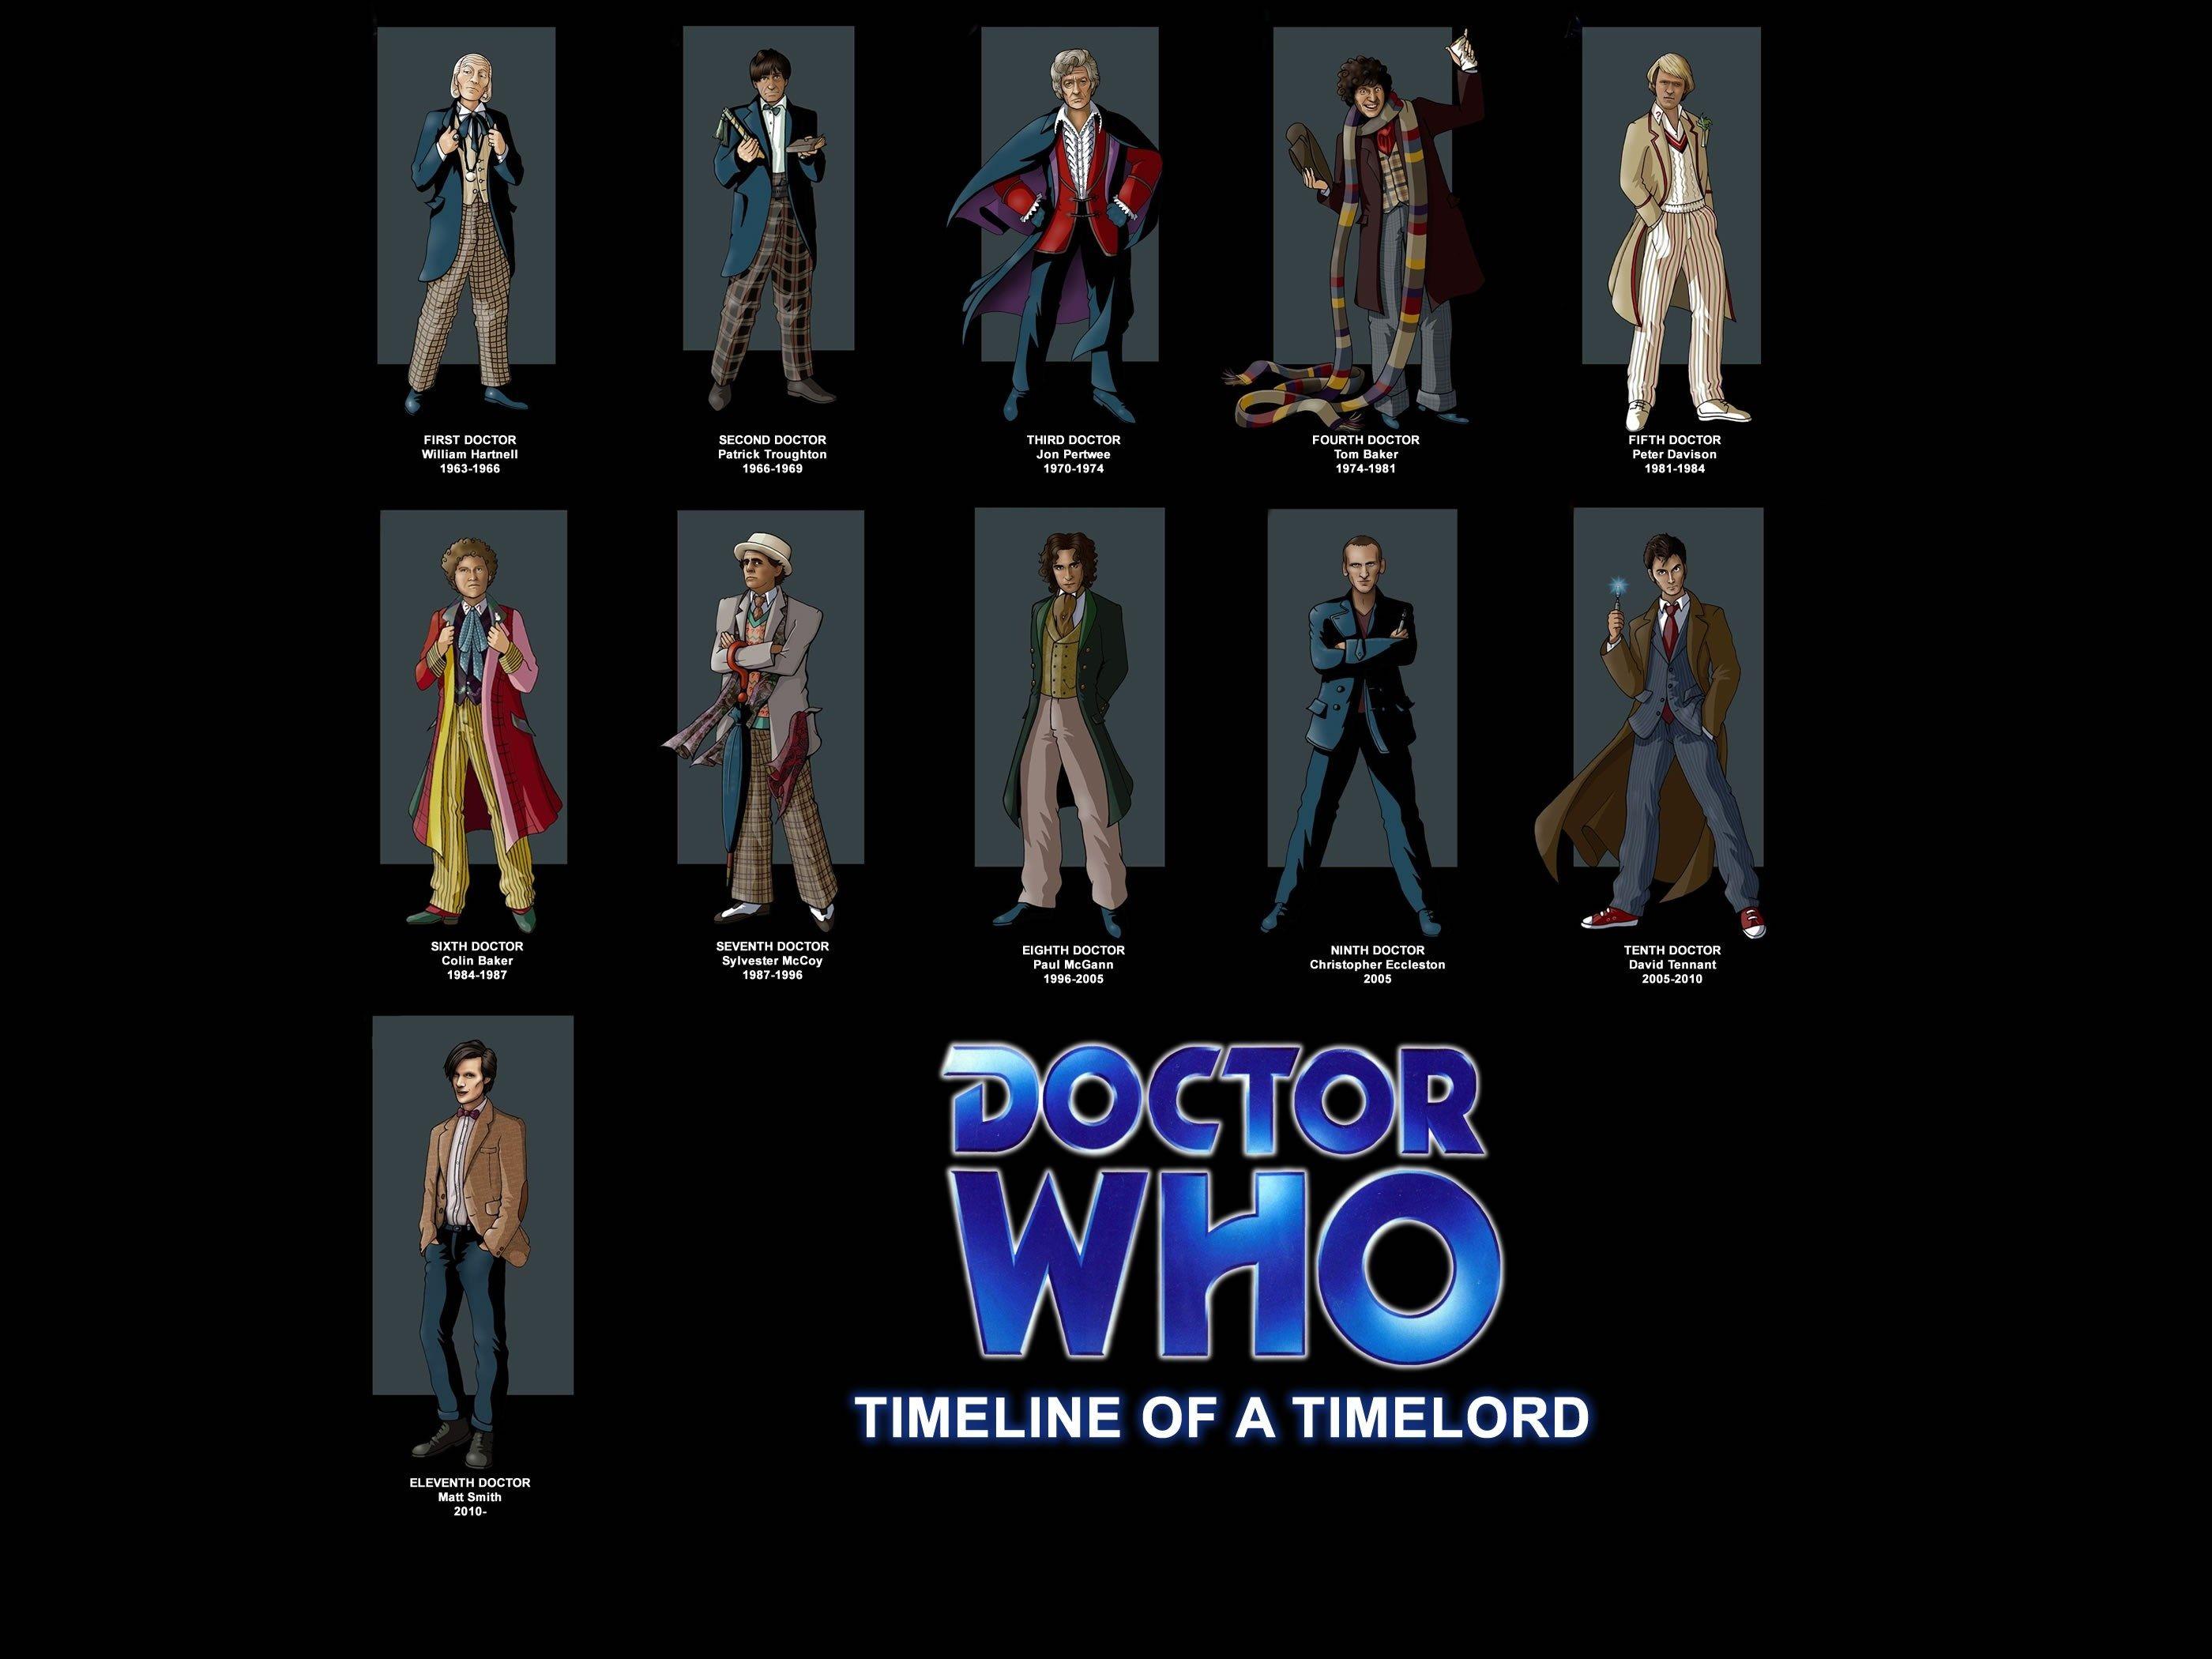 Download Wallpaper Mac Doctor Who - a6bdb45ed16e080b2a6048dededba518  Gallery_794923.jpg